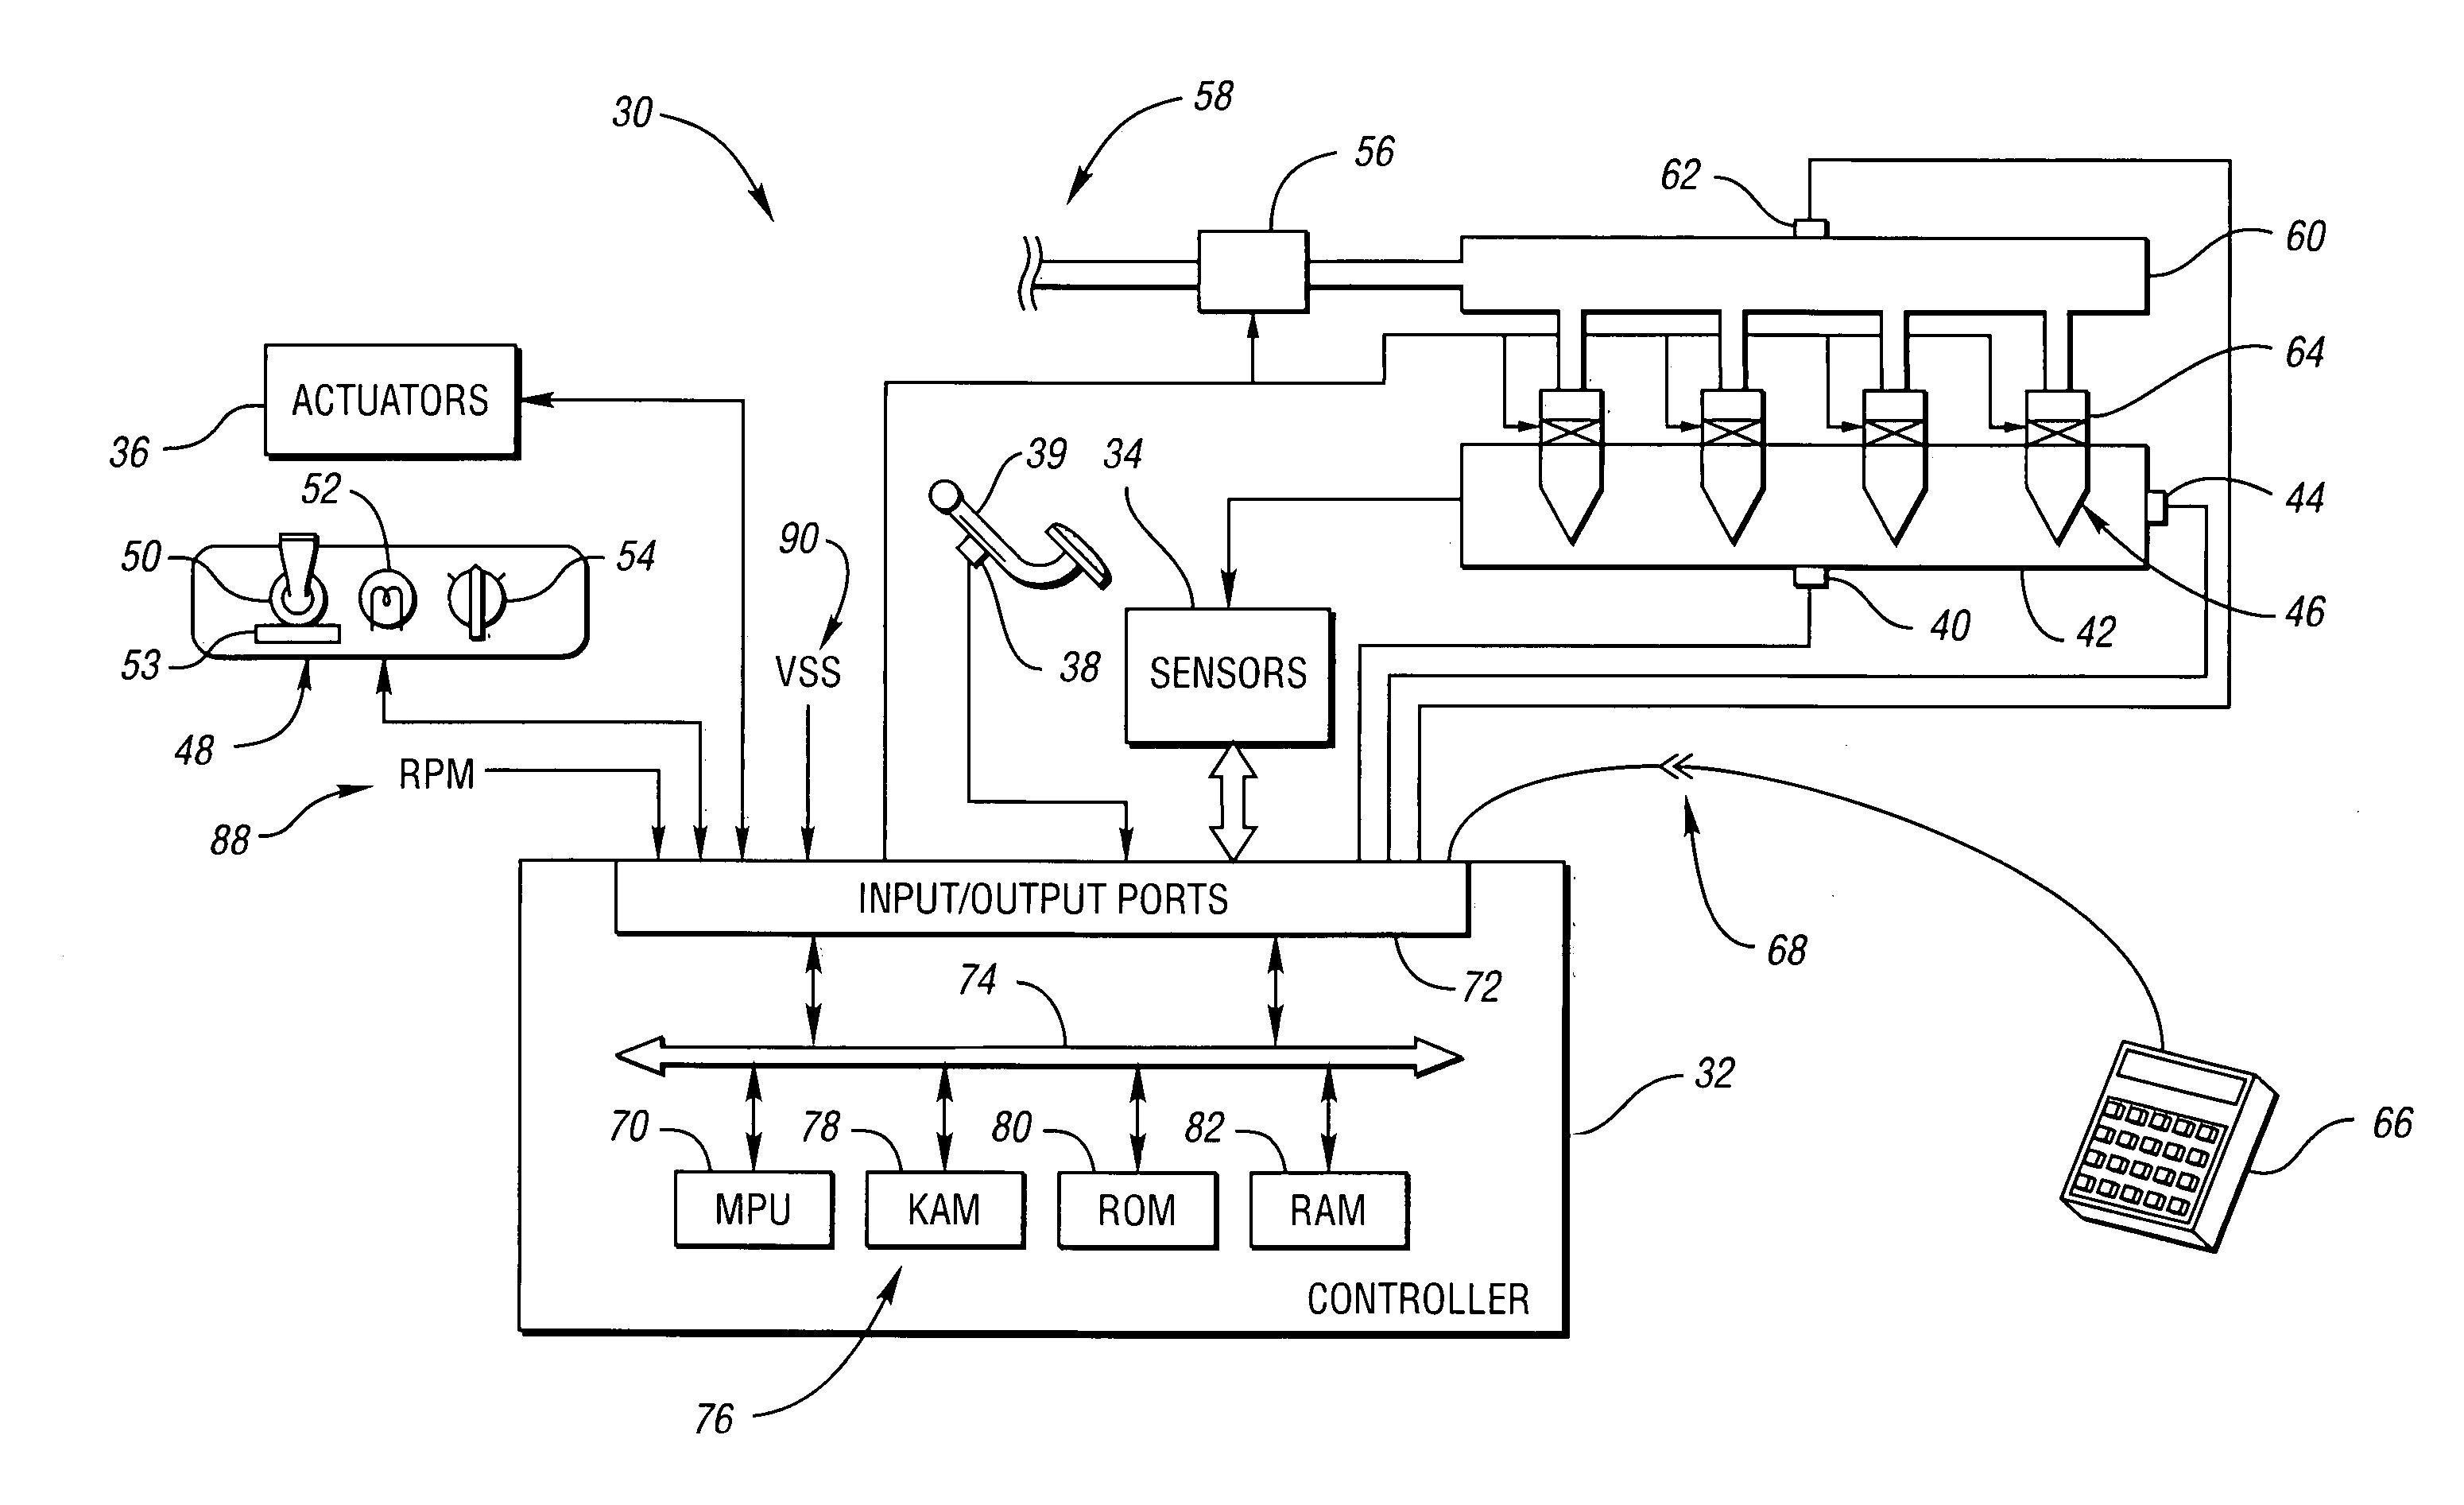 honeywell fcu thermostat wiring diagram gibson guitar pickup diagrams detroit controls